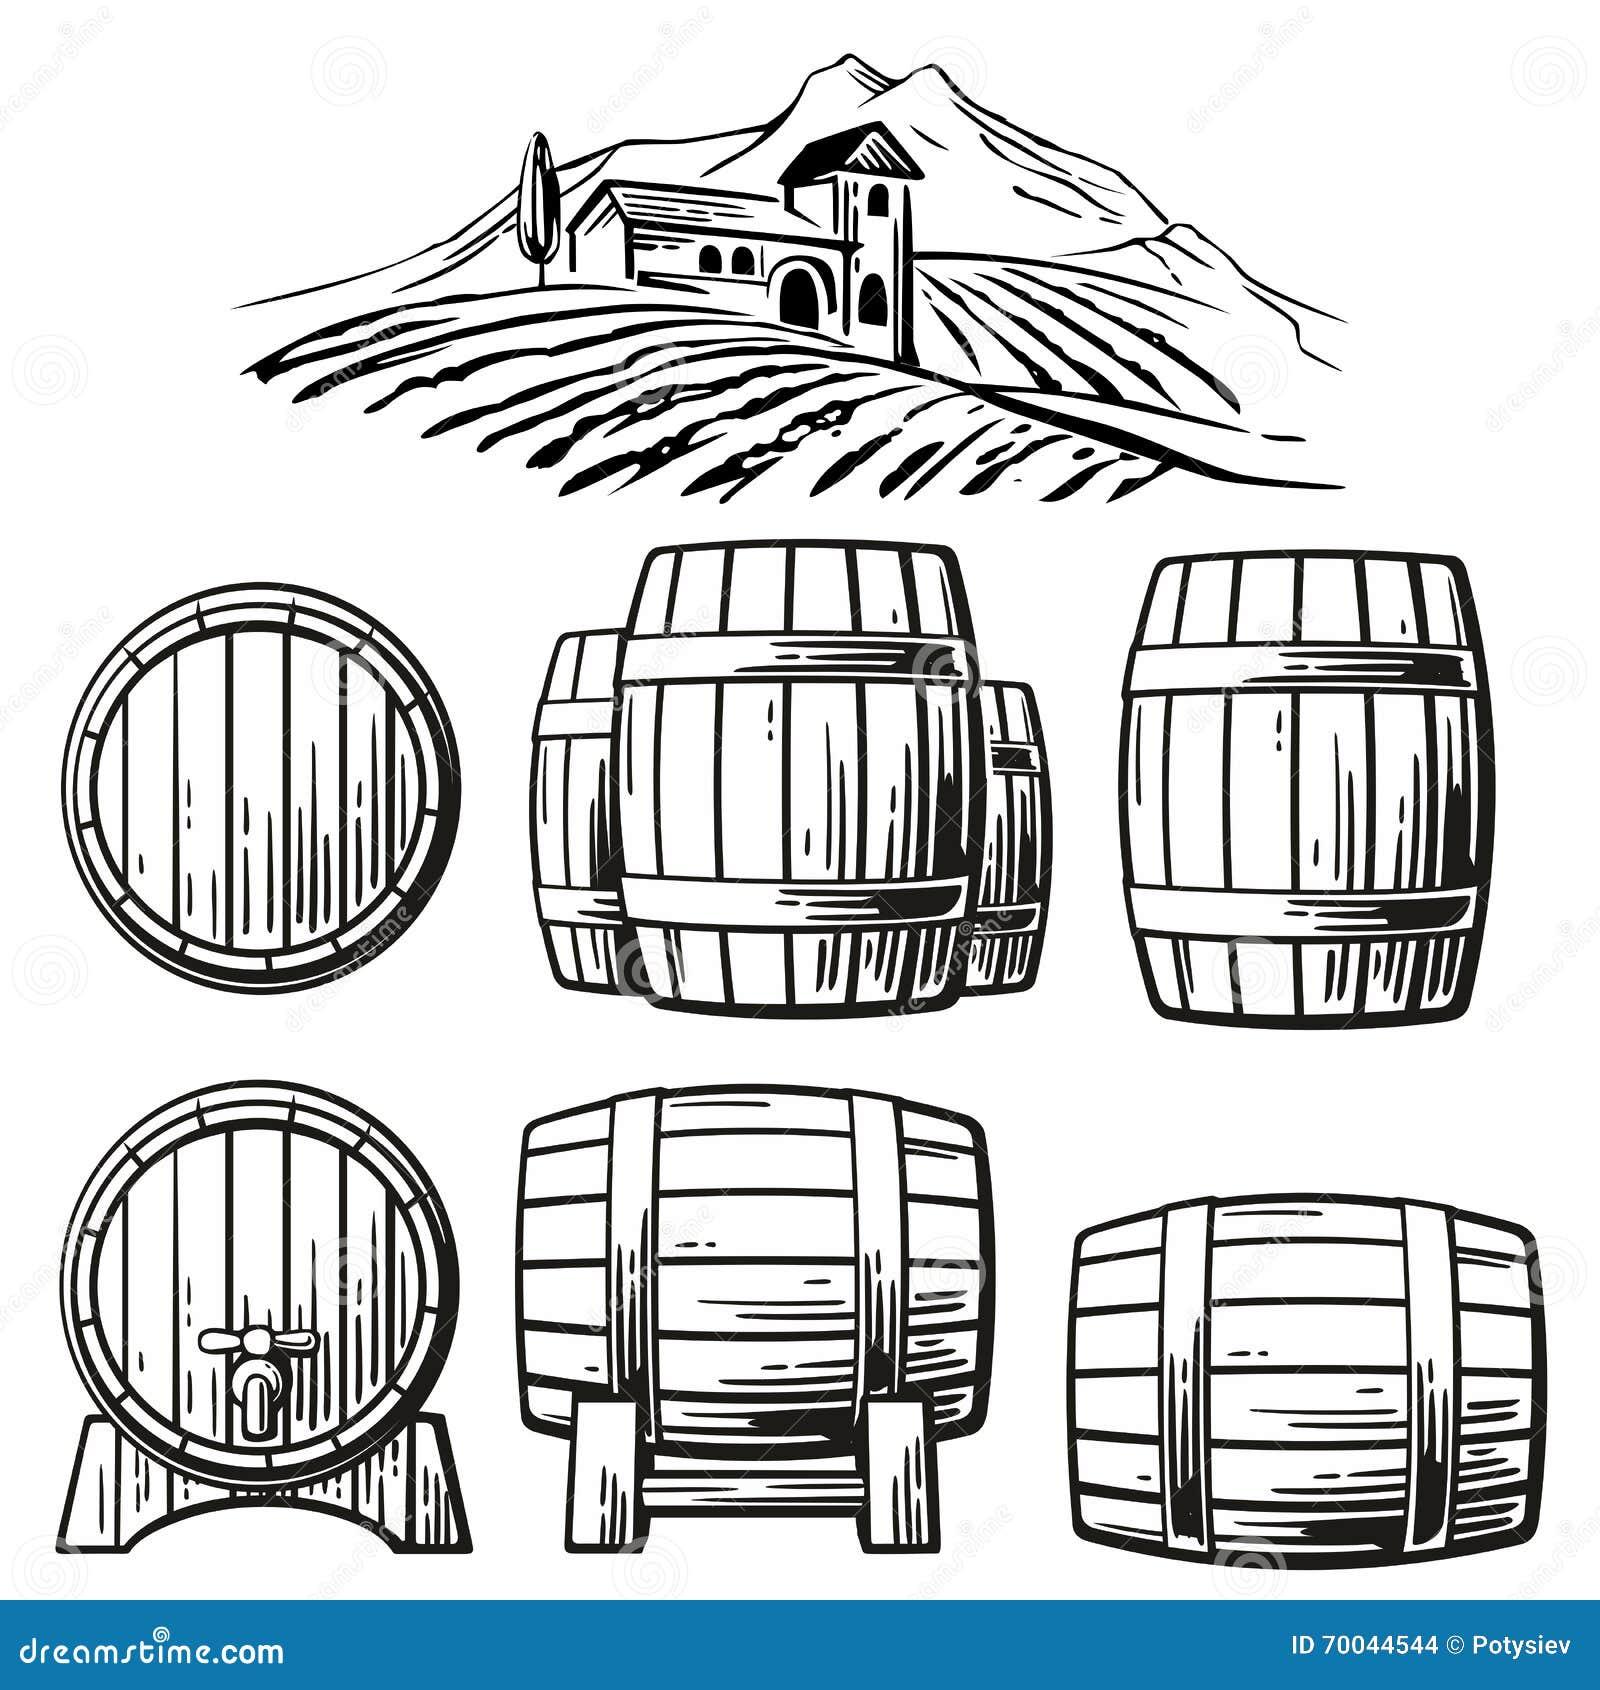 Wooden barrel set and rural landscape with villa, vineyard fields, hills, mountains. Black and white vintage vector illustration